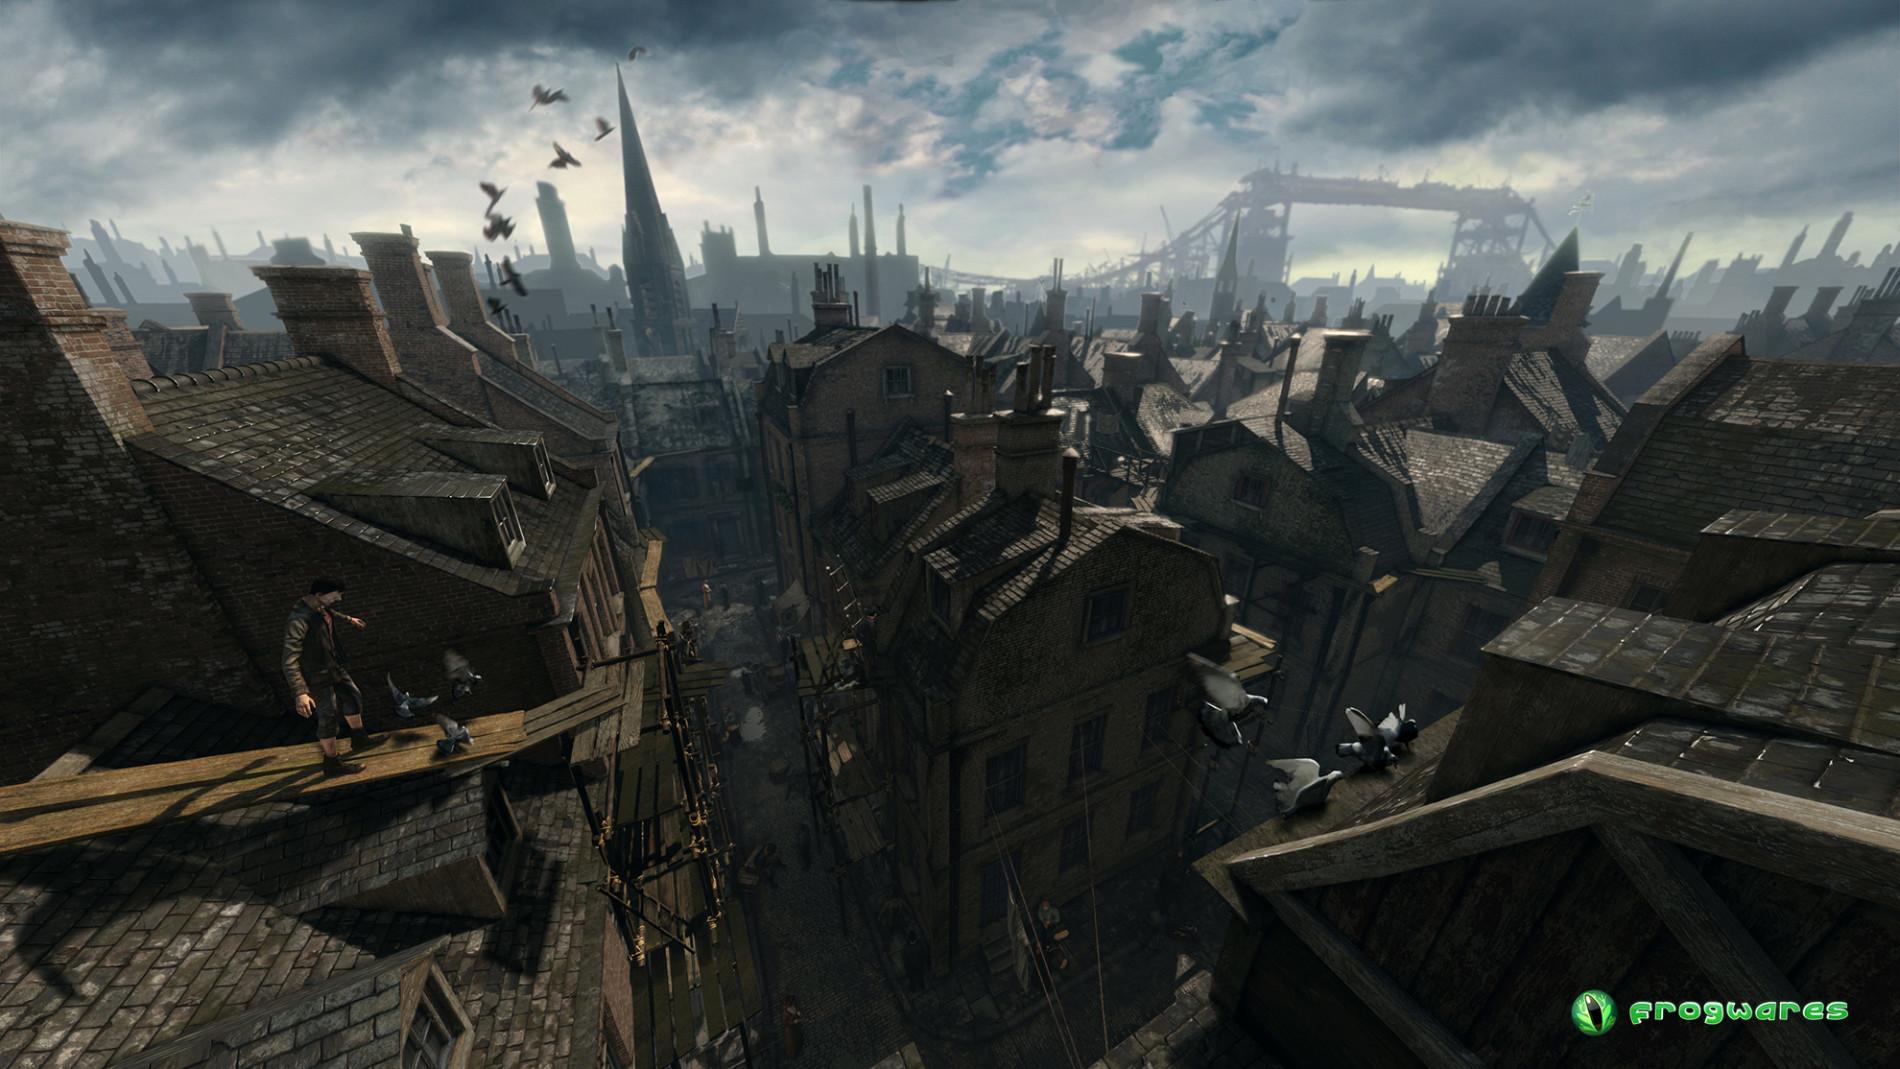 Devil's Daughter Whitechapel roofs